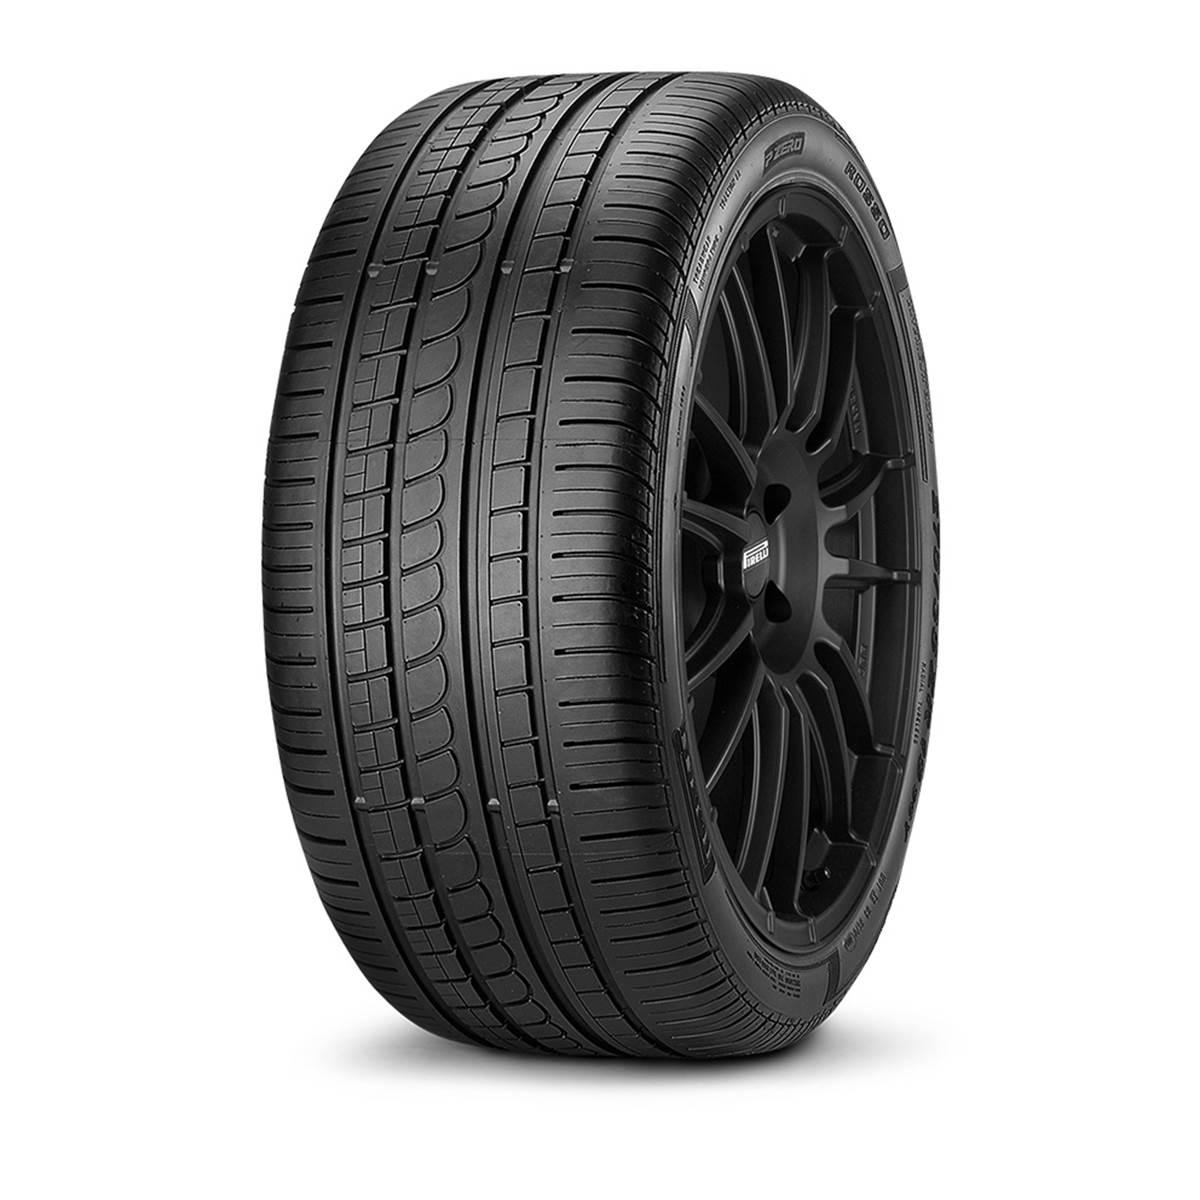 Pneu Pirelli 235/40R19 96Y Pzero Nero (Gt) XL